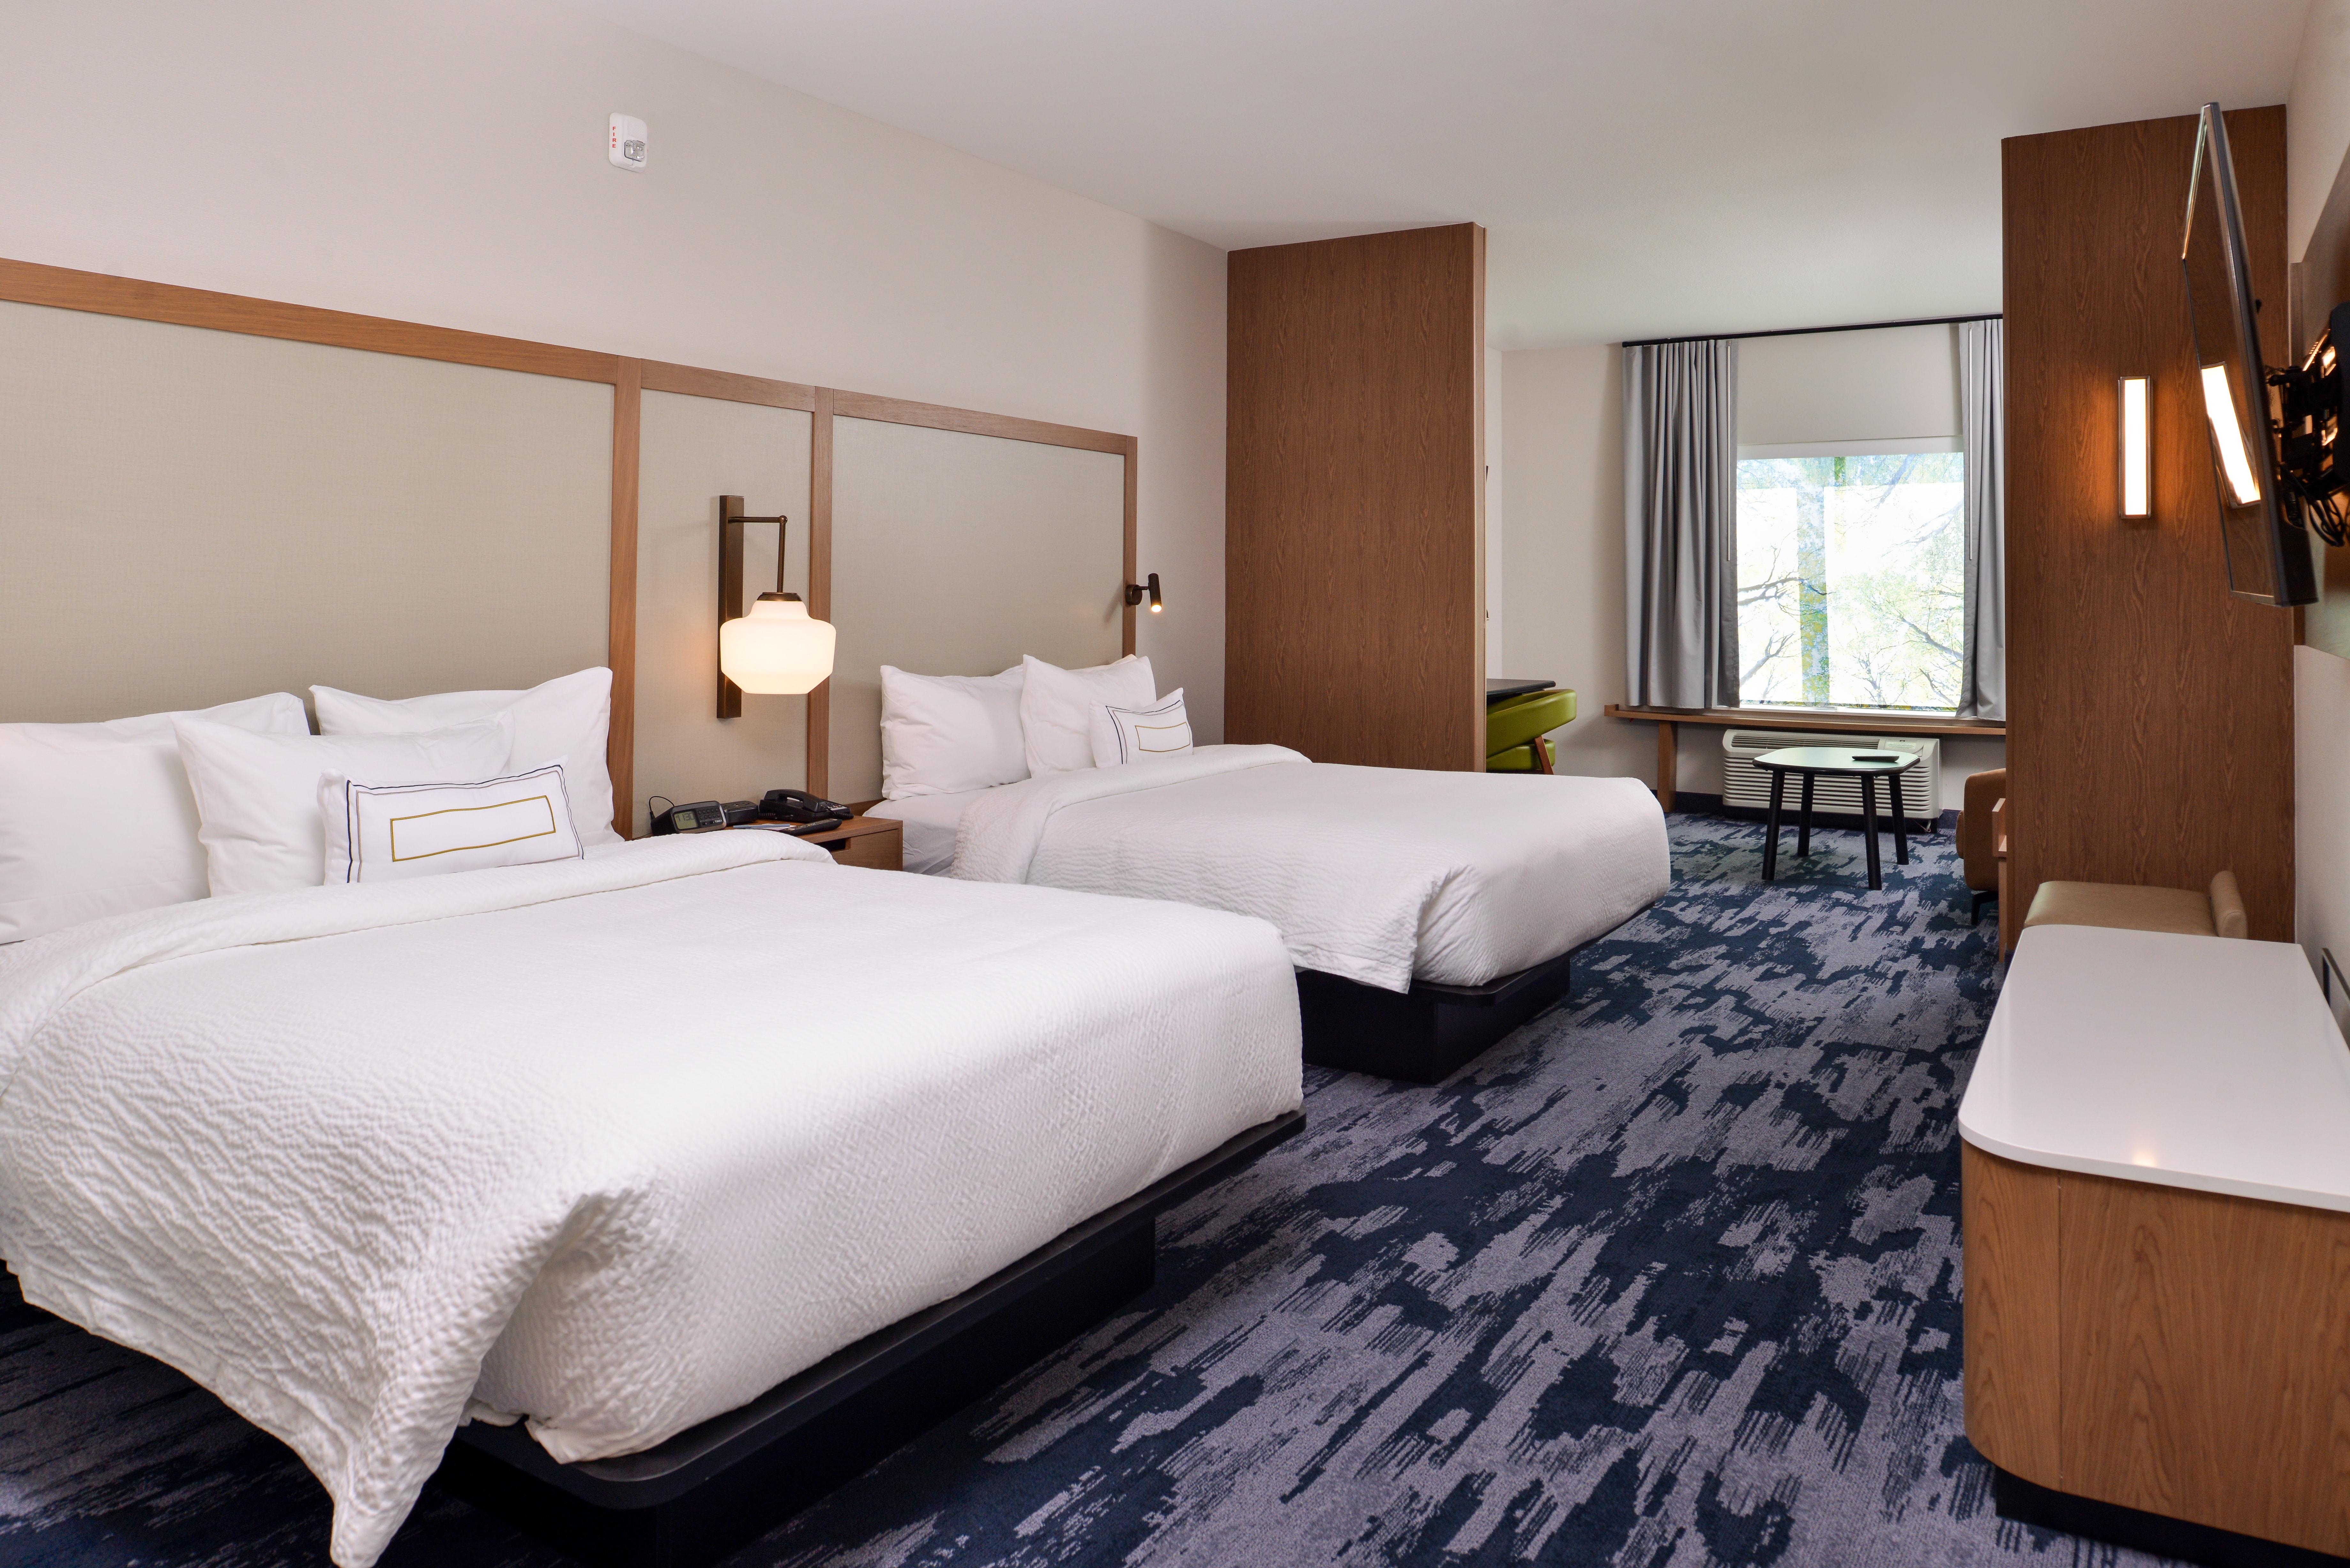 https://www.hotelsbyday.com/_data/default-hotel_image/3/15065/fis-mspfk-2queensuit-97gy6.jpg